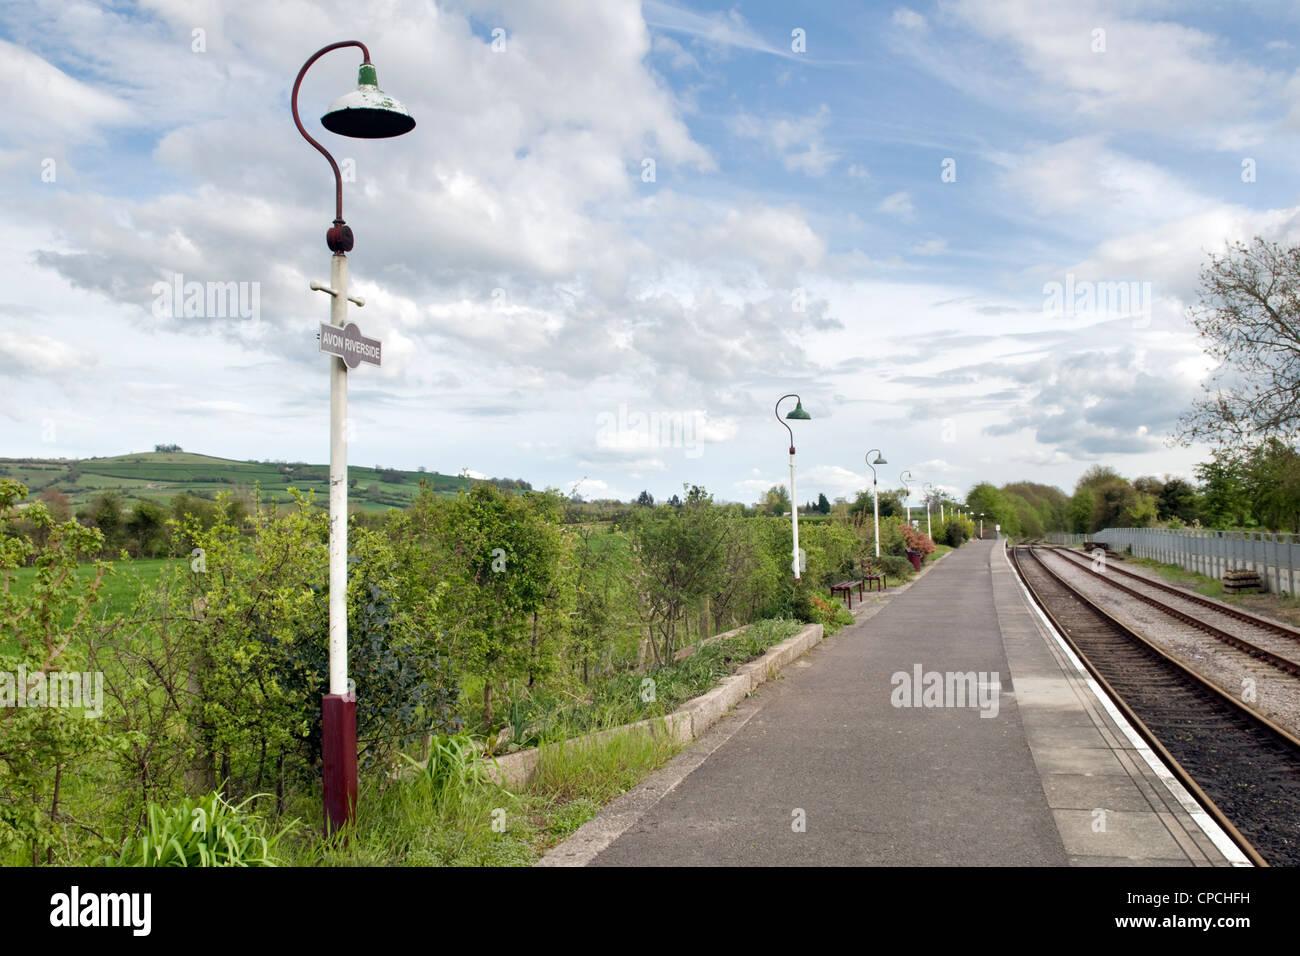 Avon riverside station on the Avon valley railway line near Saltford and Bitton, Bristol, Uk on fine day - Stock Image